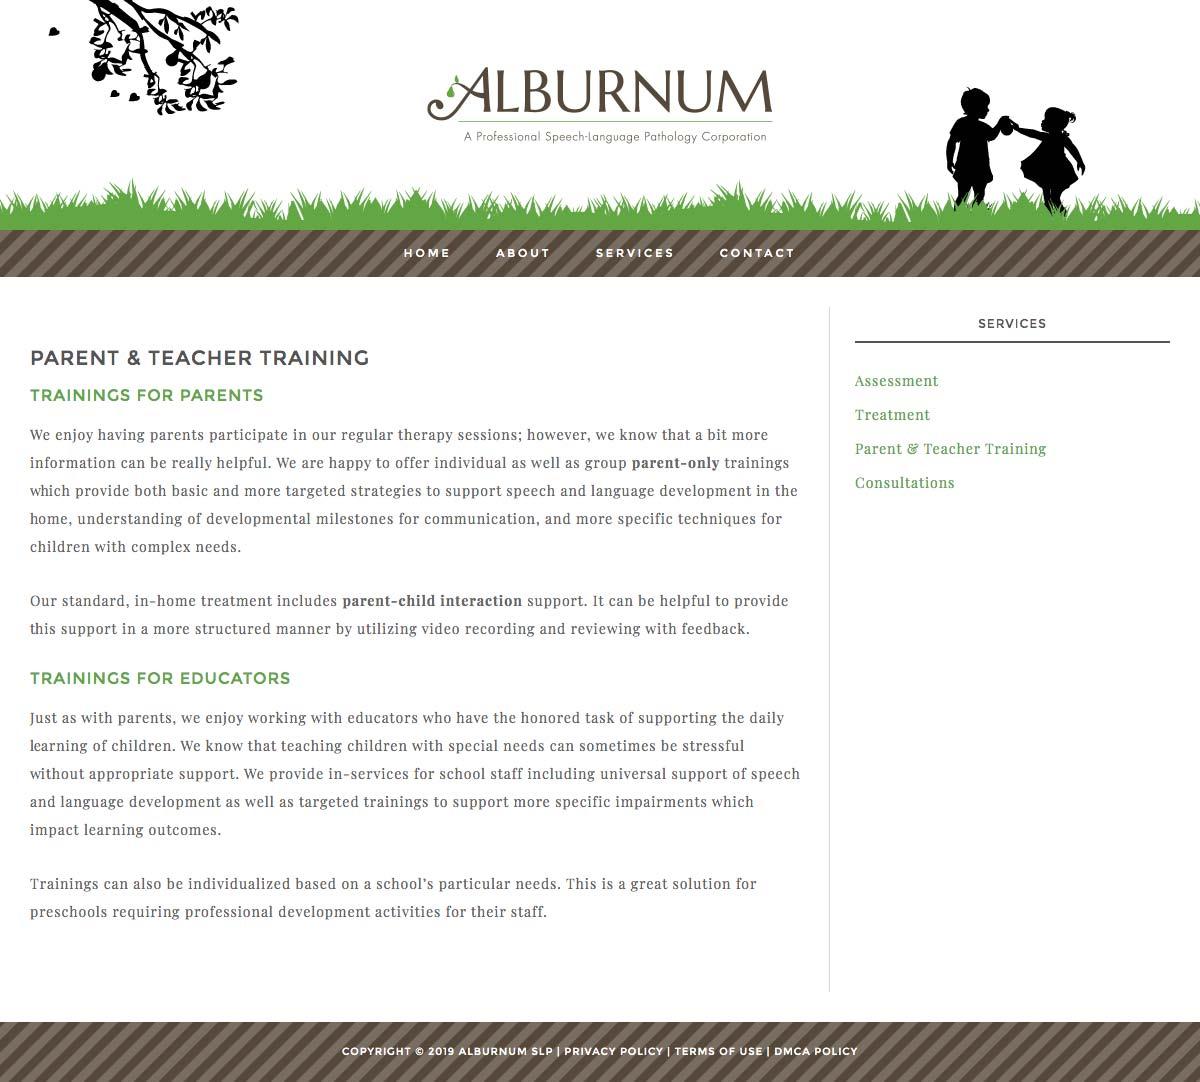 Alburnum Services page screen shot